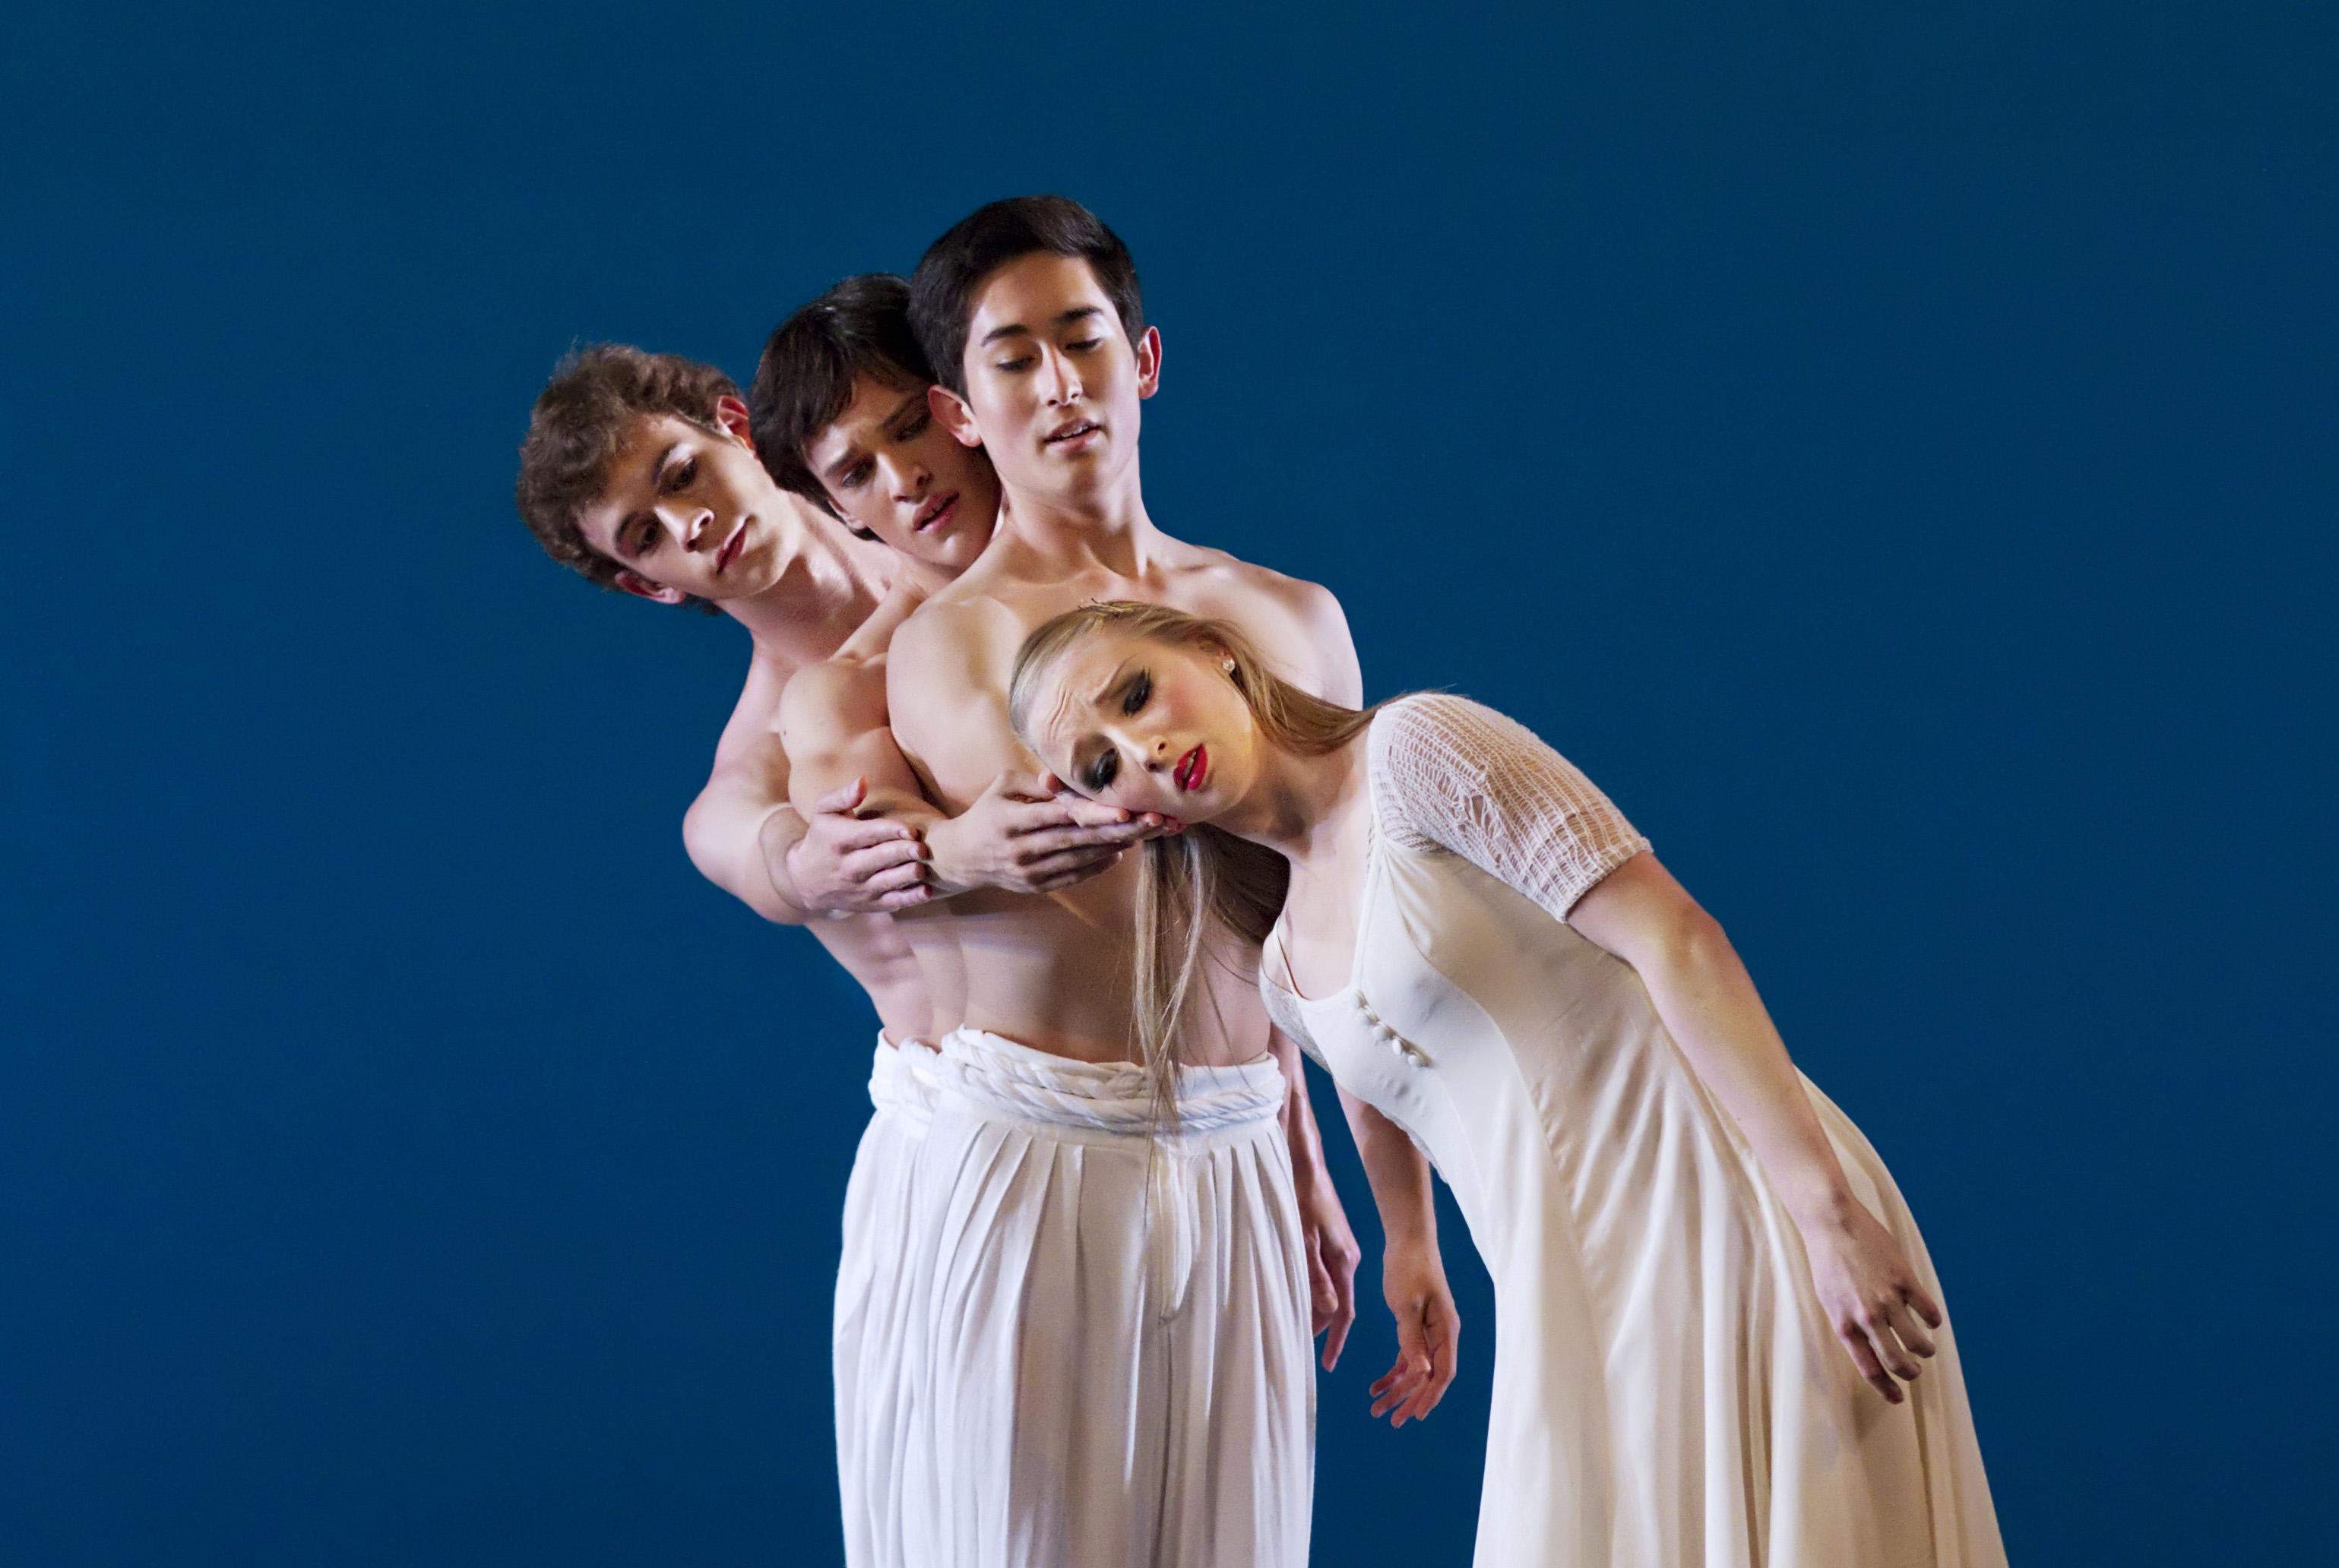 three ballet dancers dressed in white